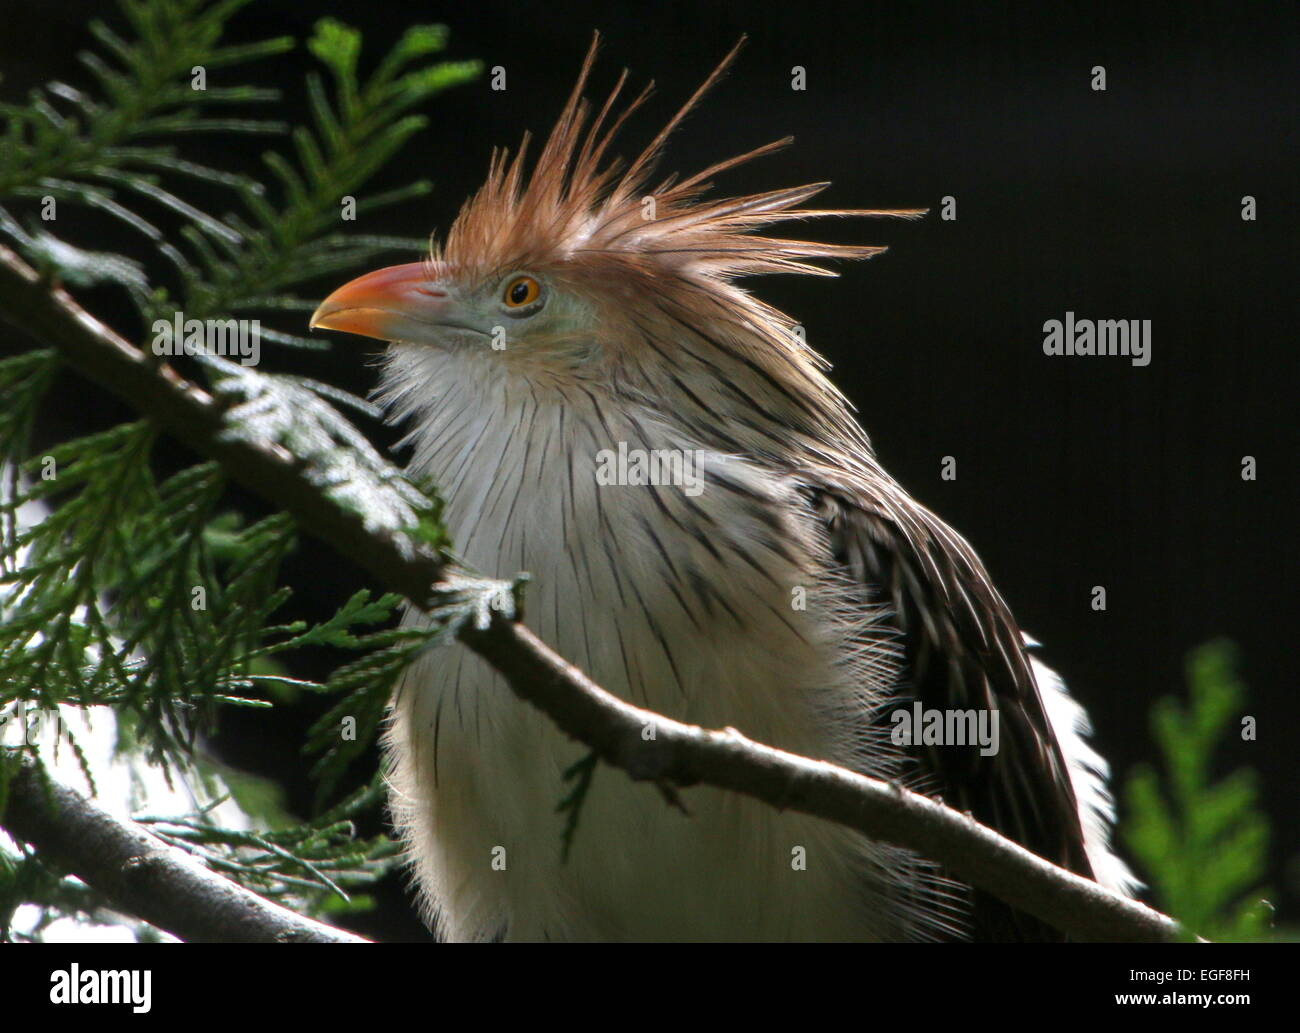 South American Guira cuckoo (Guira guira) - Stock Image